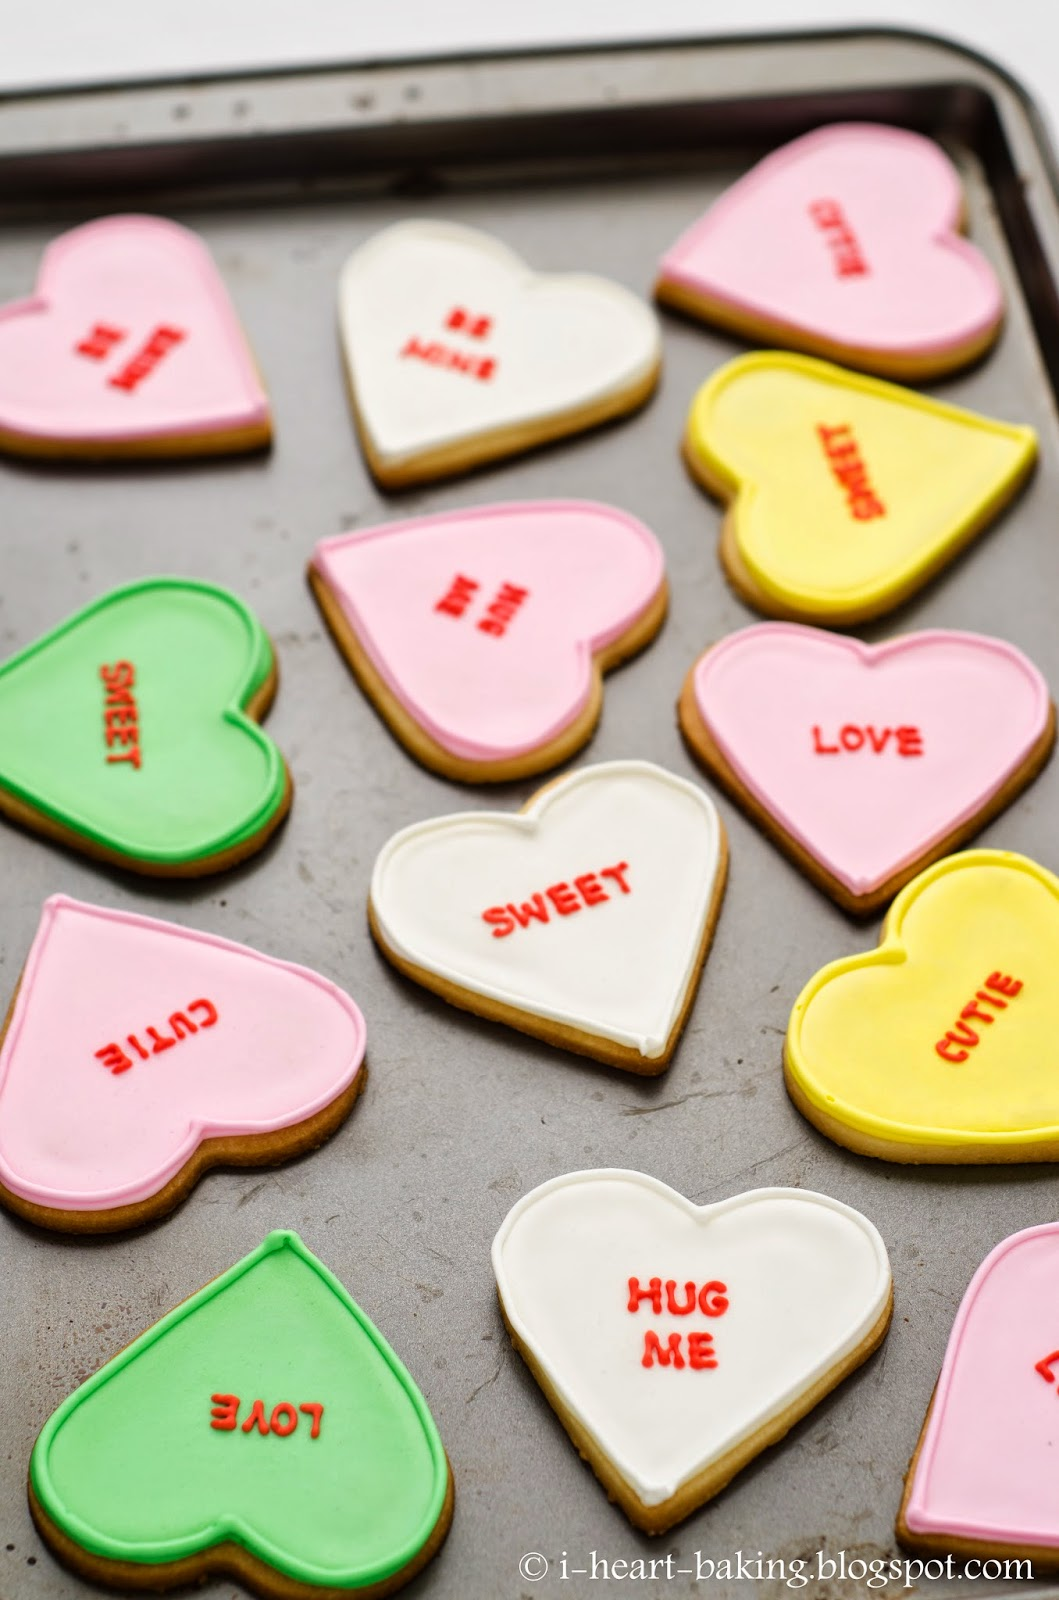 heart baking!: valentine's conversation heart cookies